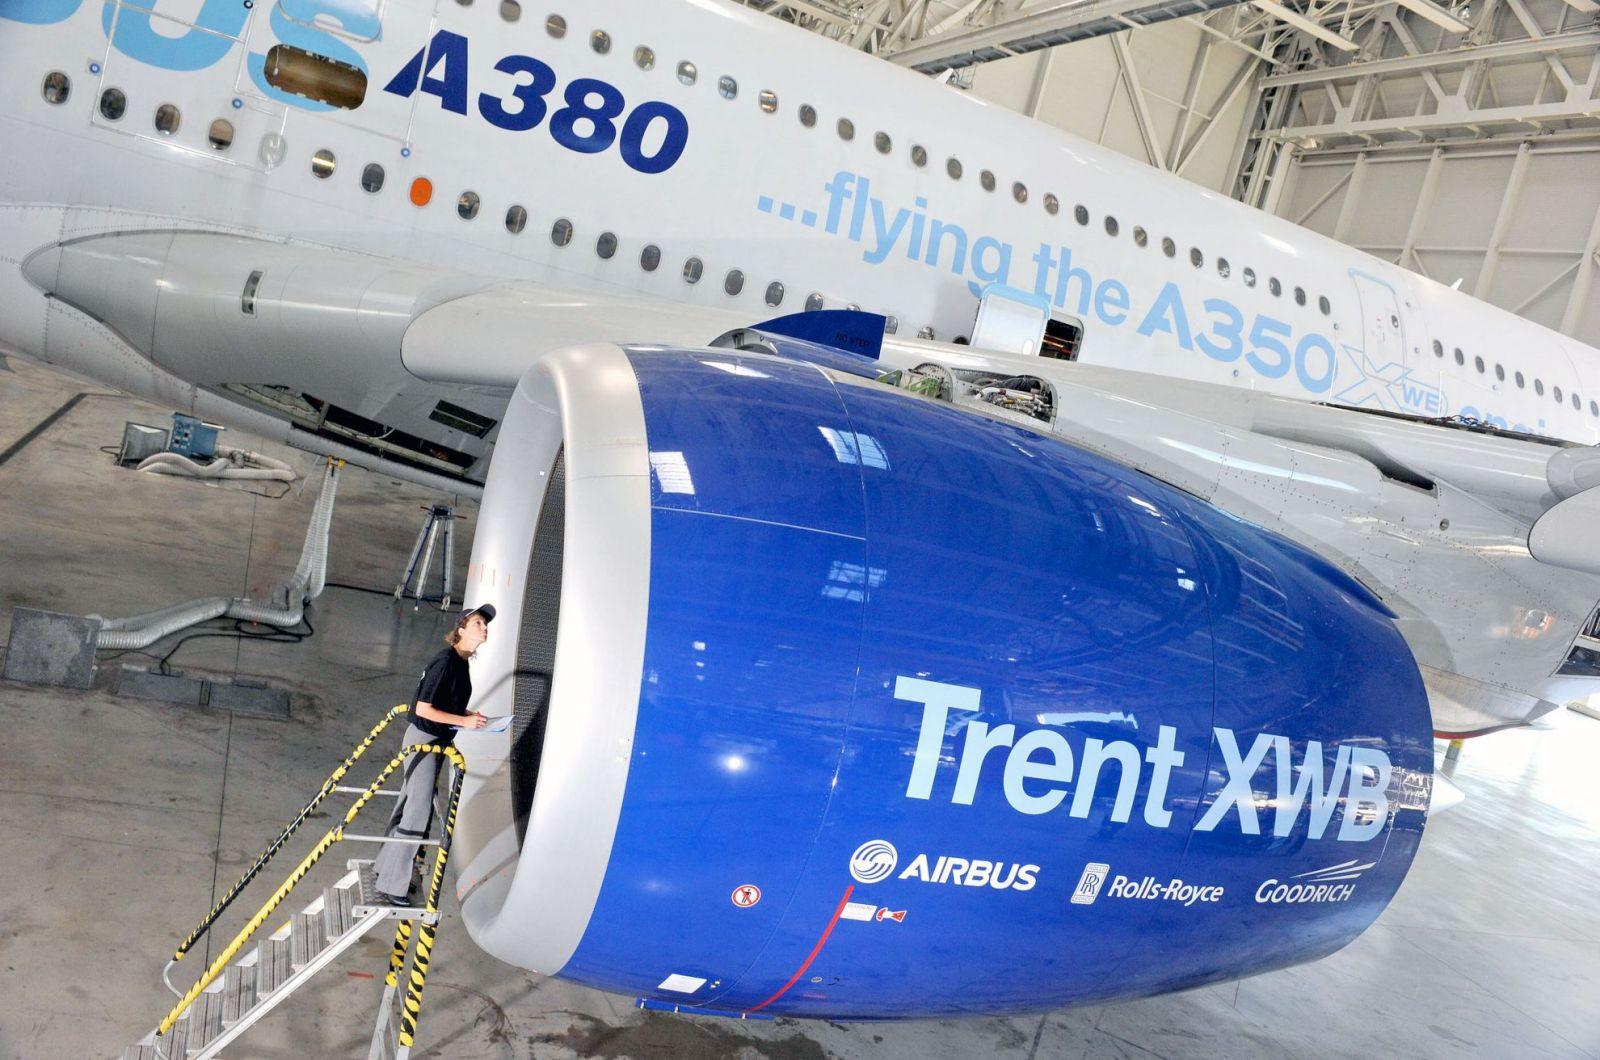 trent xwb powerplant completes first test flight on a380